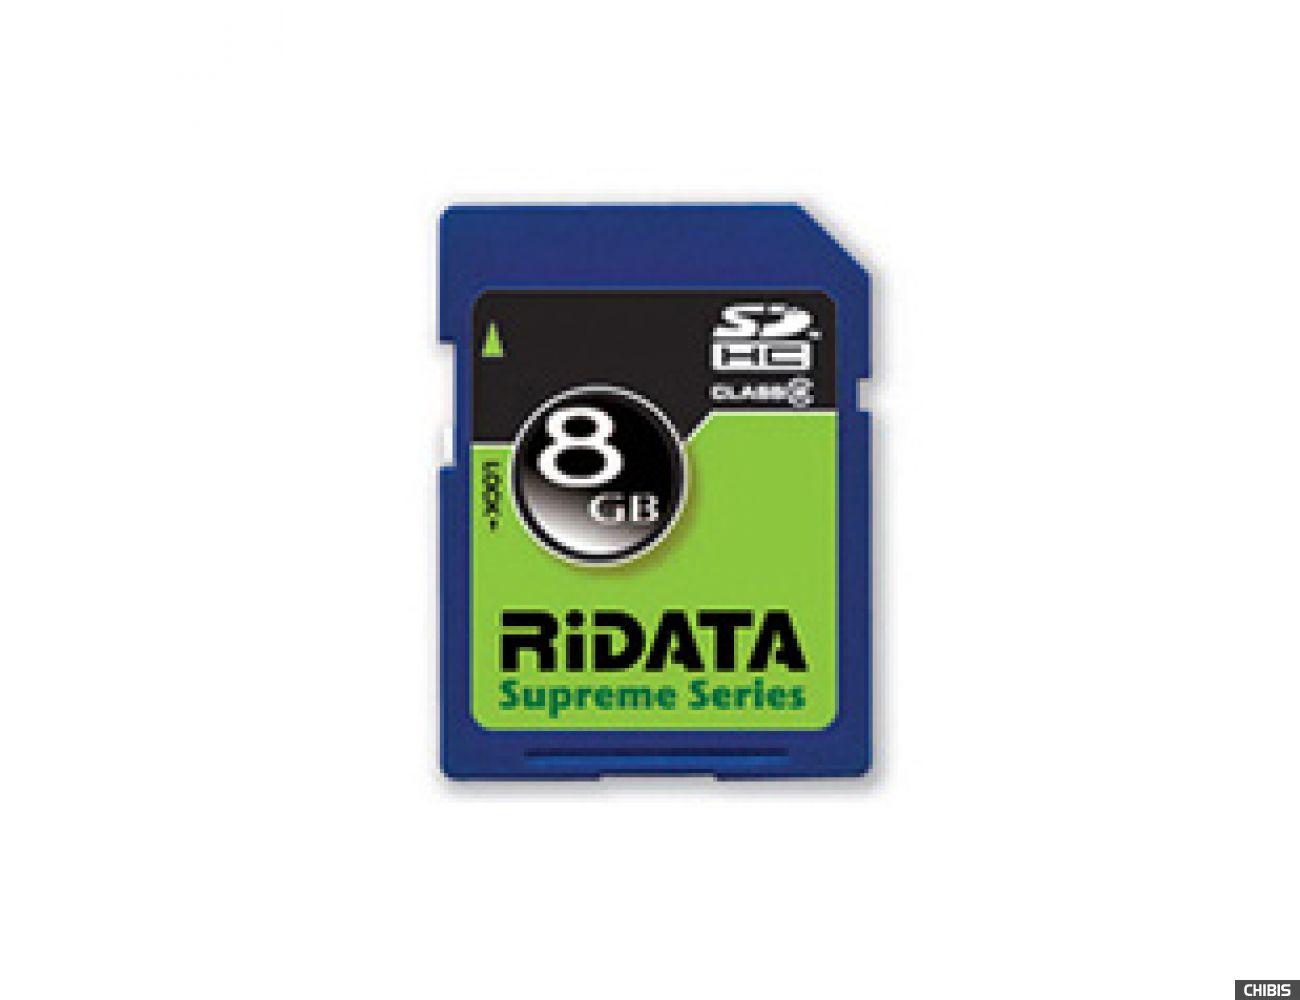 Карта памяти RIDATA SDHC 8Gb (Class 2)